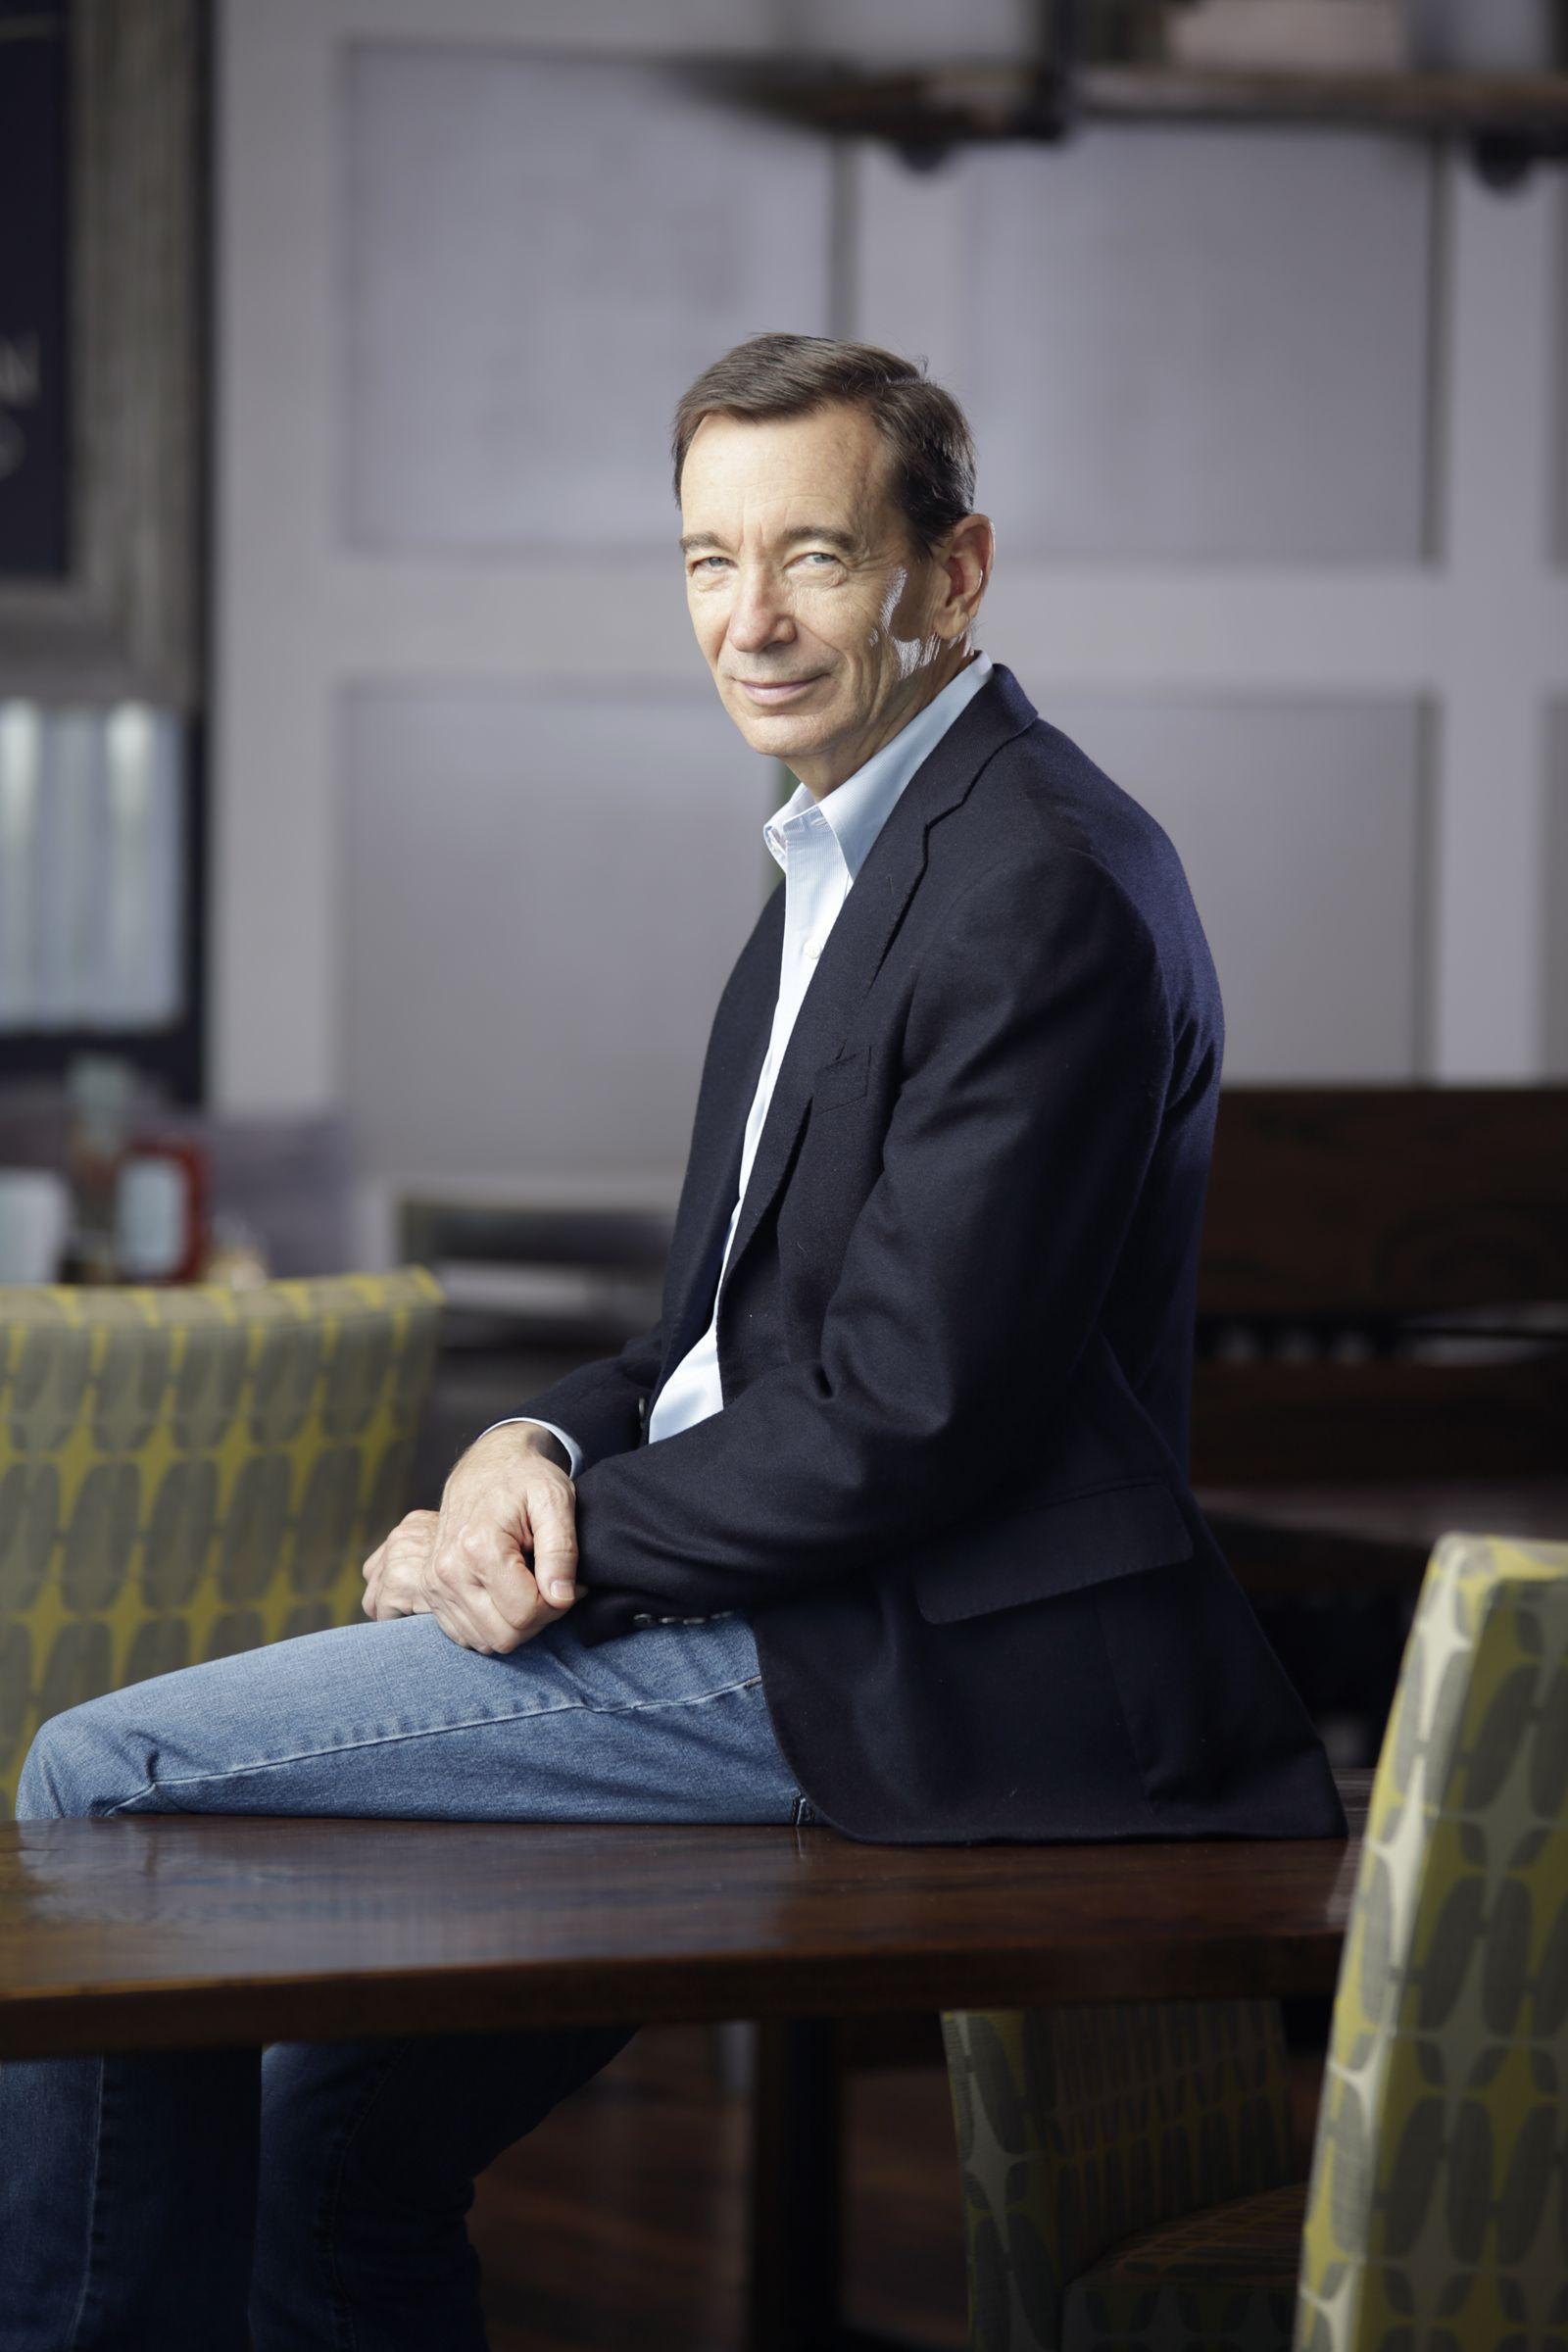 First Watch Restaurants Announces CEO Transition